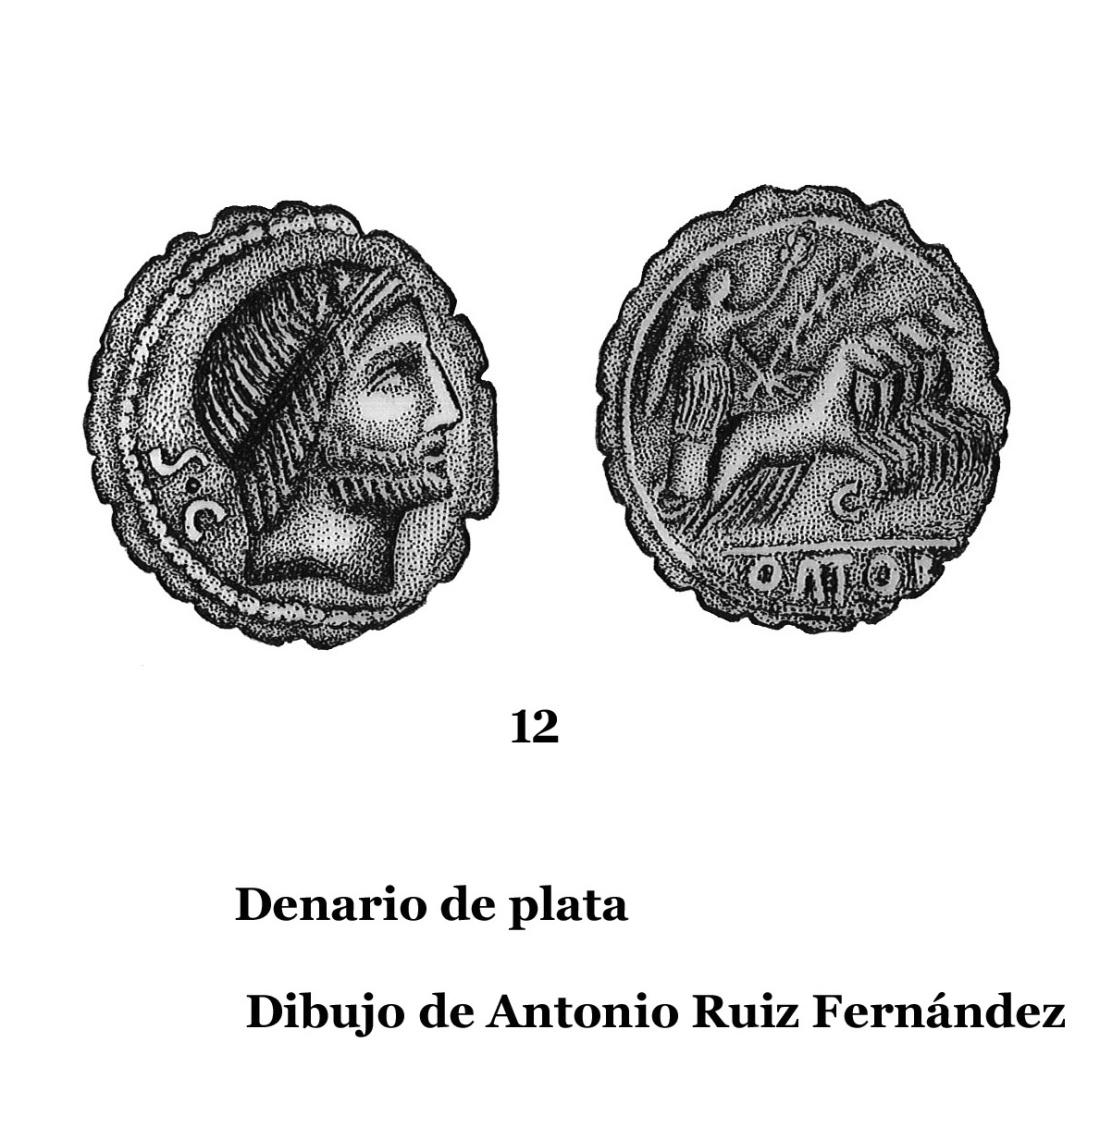 12DENARIOS DE PLATA, DIBUJOS 12